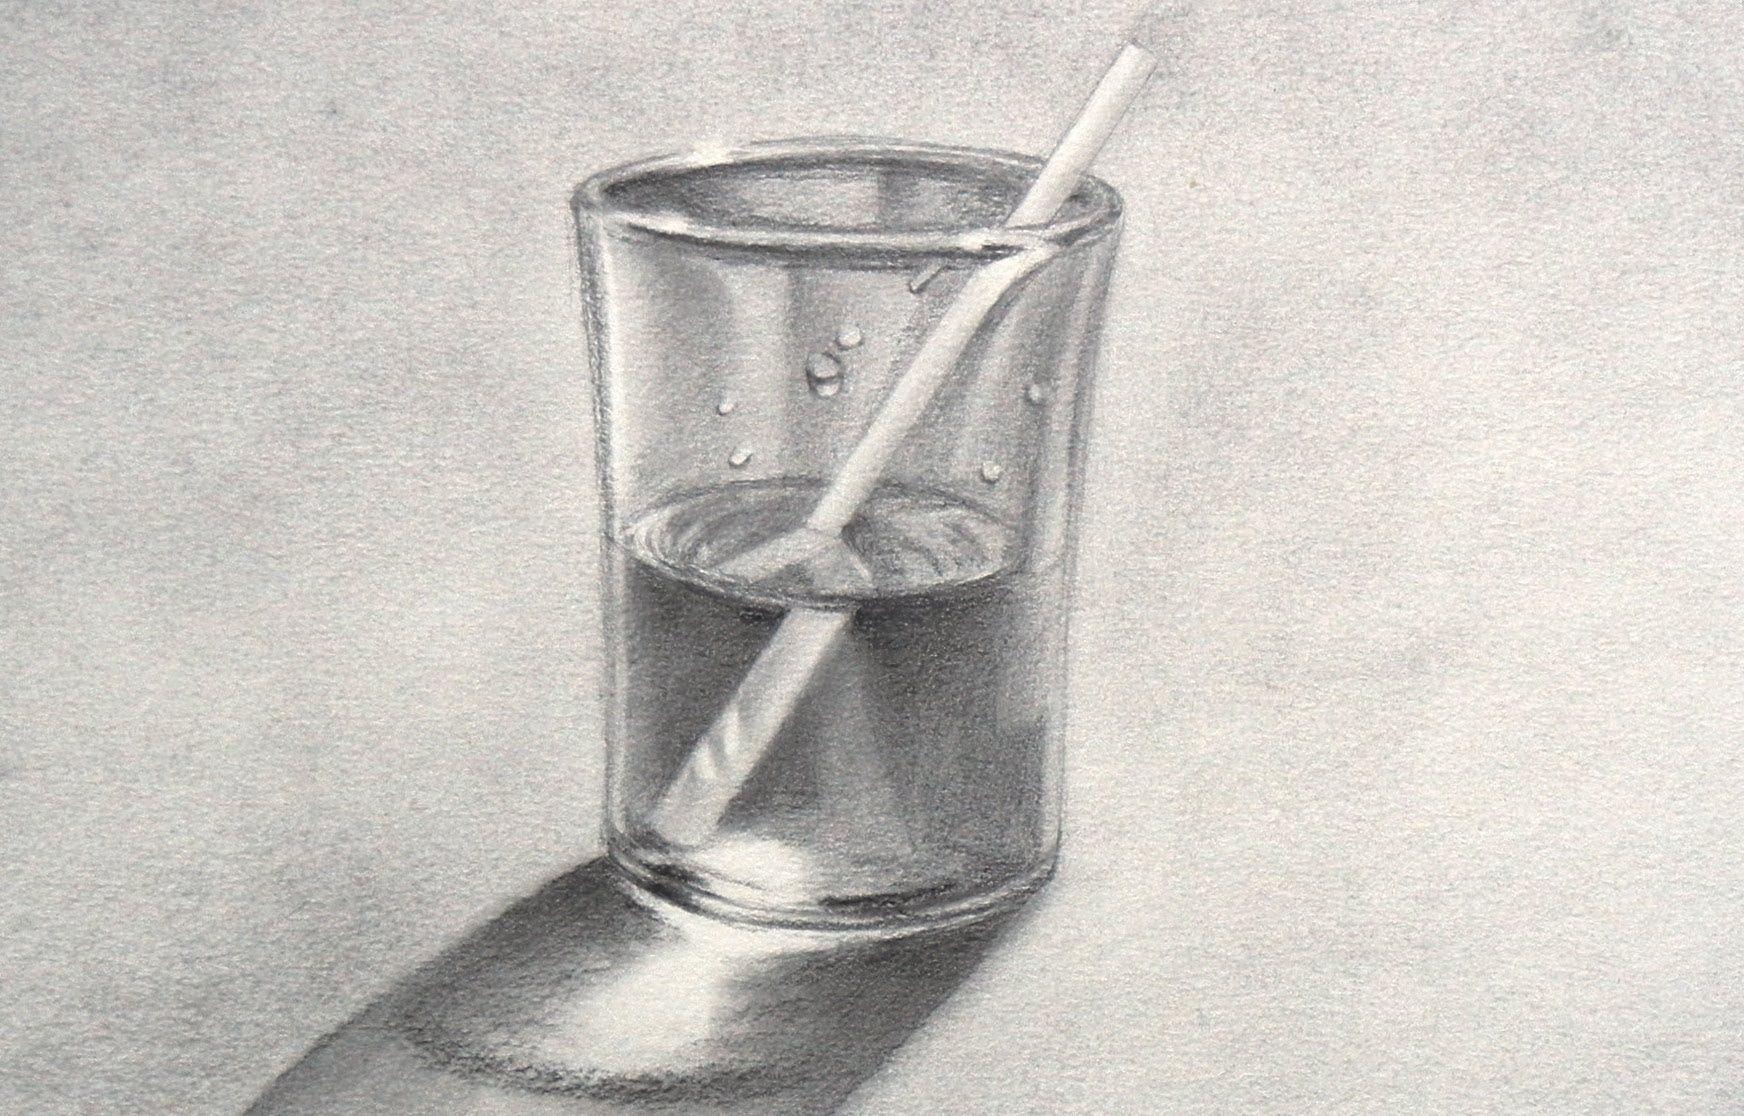 Como Dibujar Un Vaso De Agua Como Dibujar Vidrio Con Imagenes